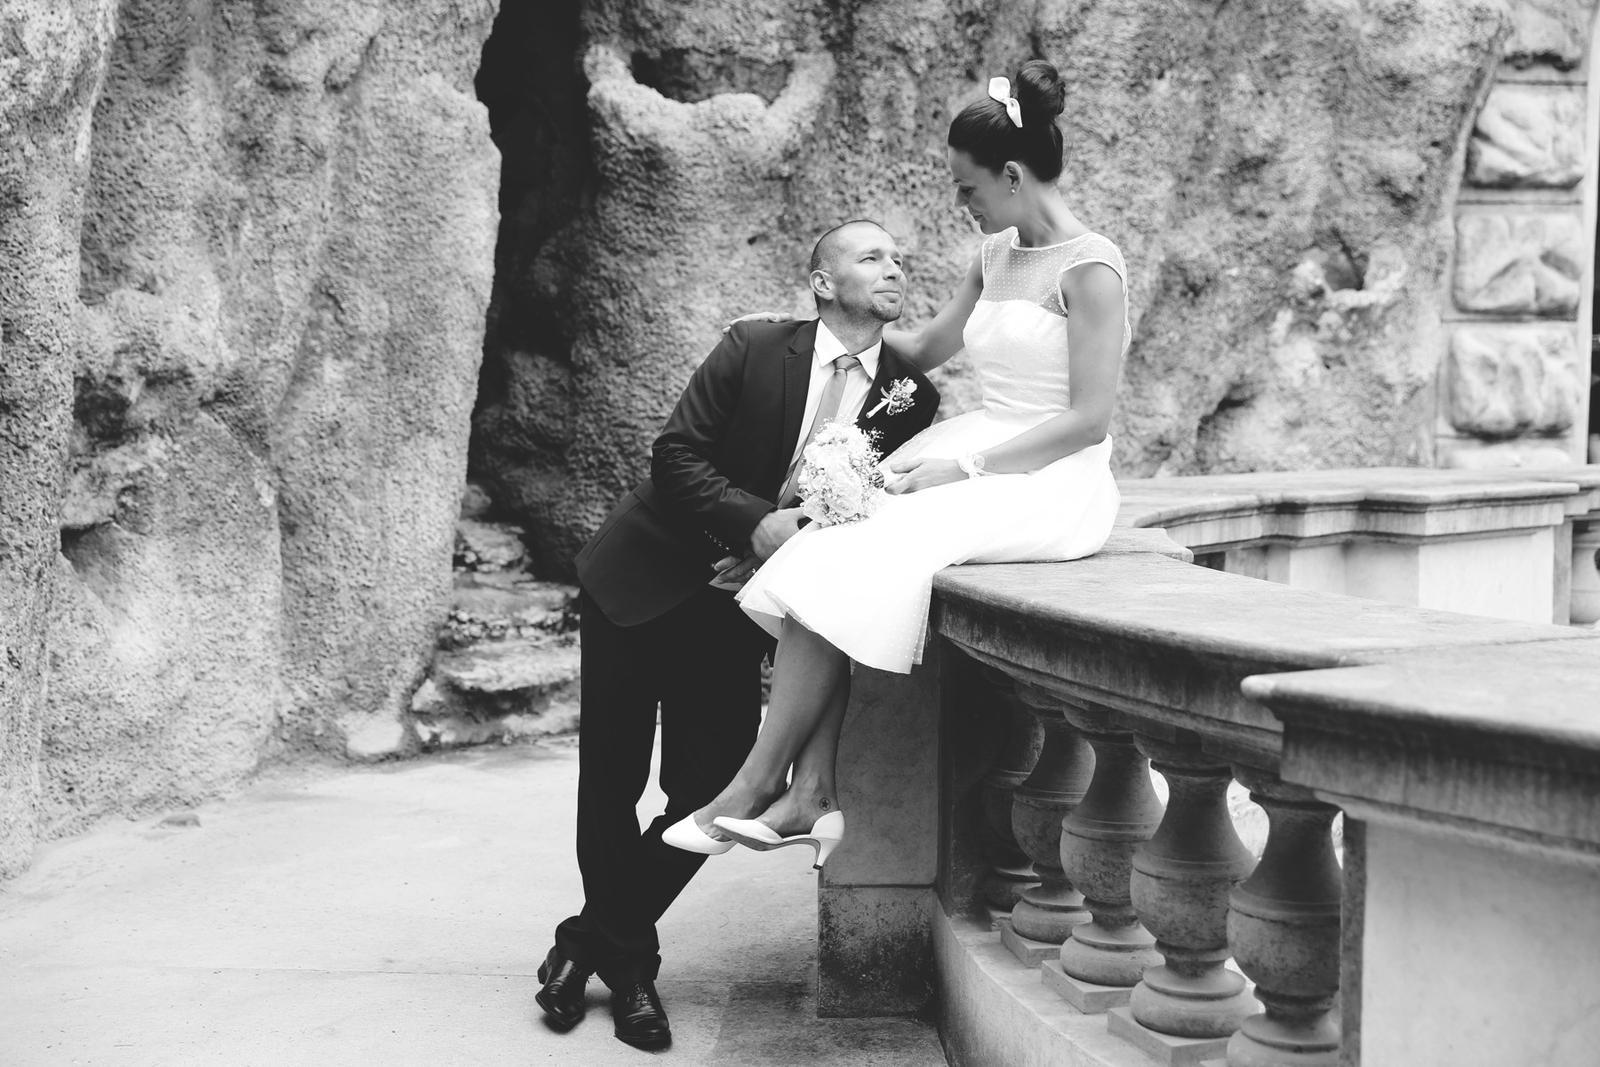 Svatební focení v Grébovce - zrcadlo v Grébovce - černobílá varianta